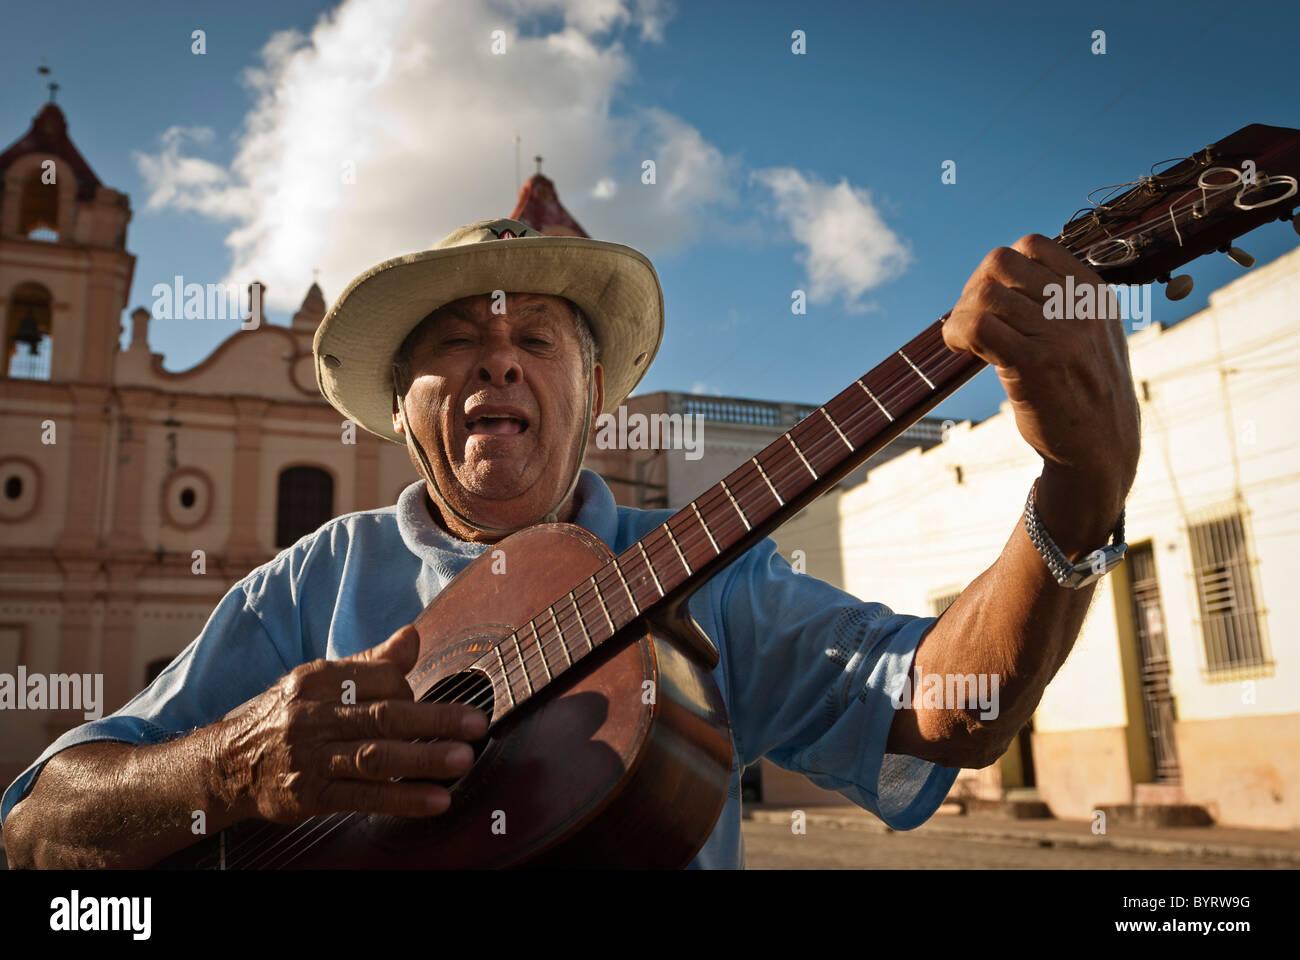 Man with Spanish guitar singing in 'Plaza del Carmen' , Camaguey, Cuba, Caribbean. - Stock Image